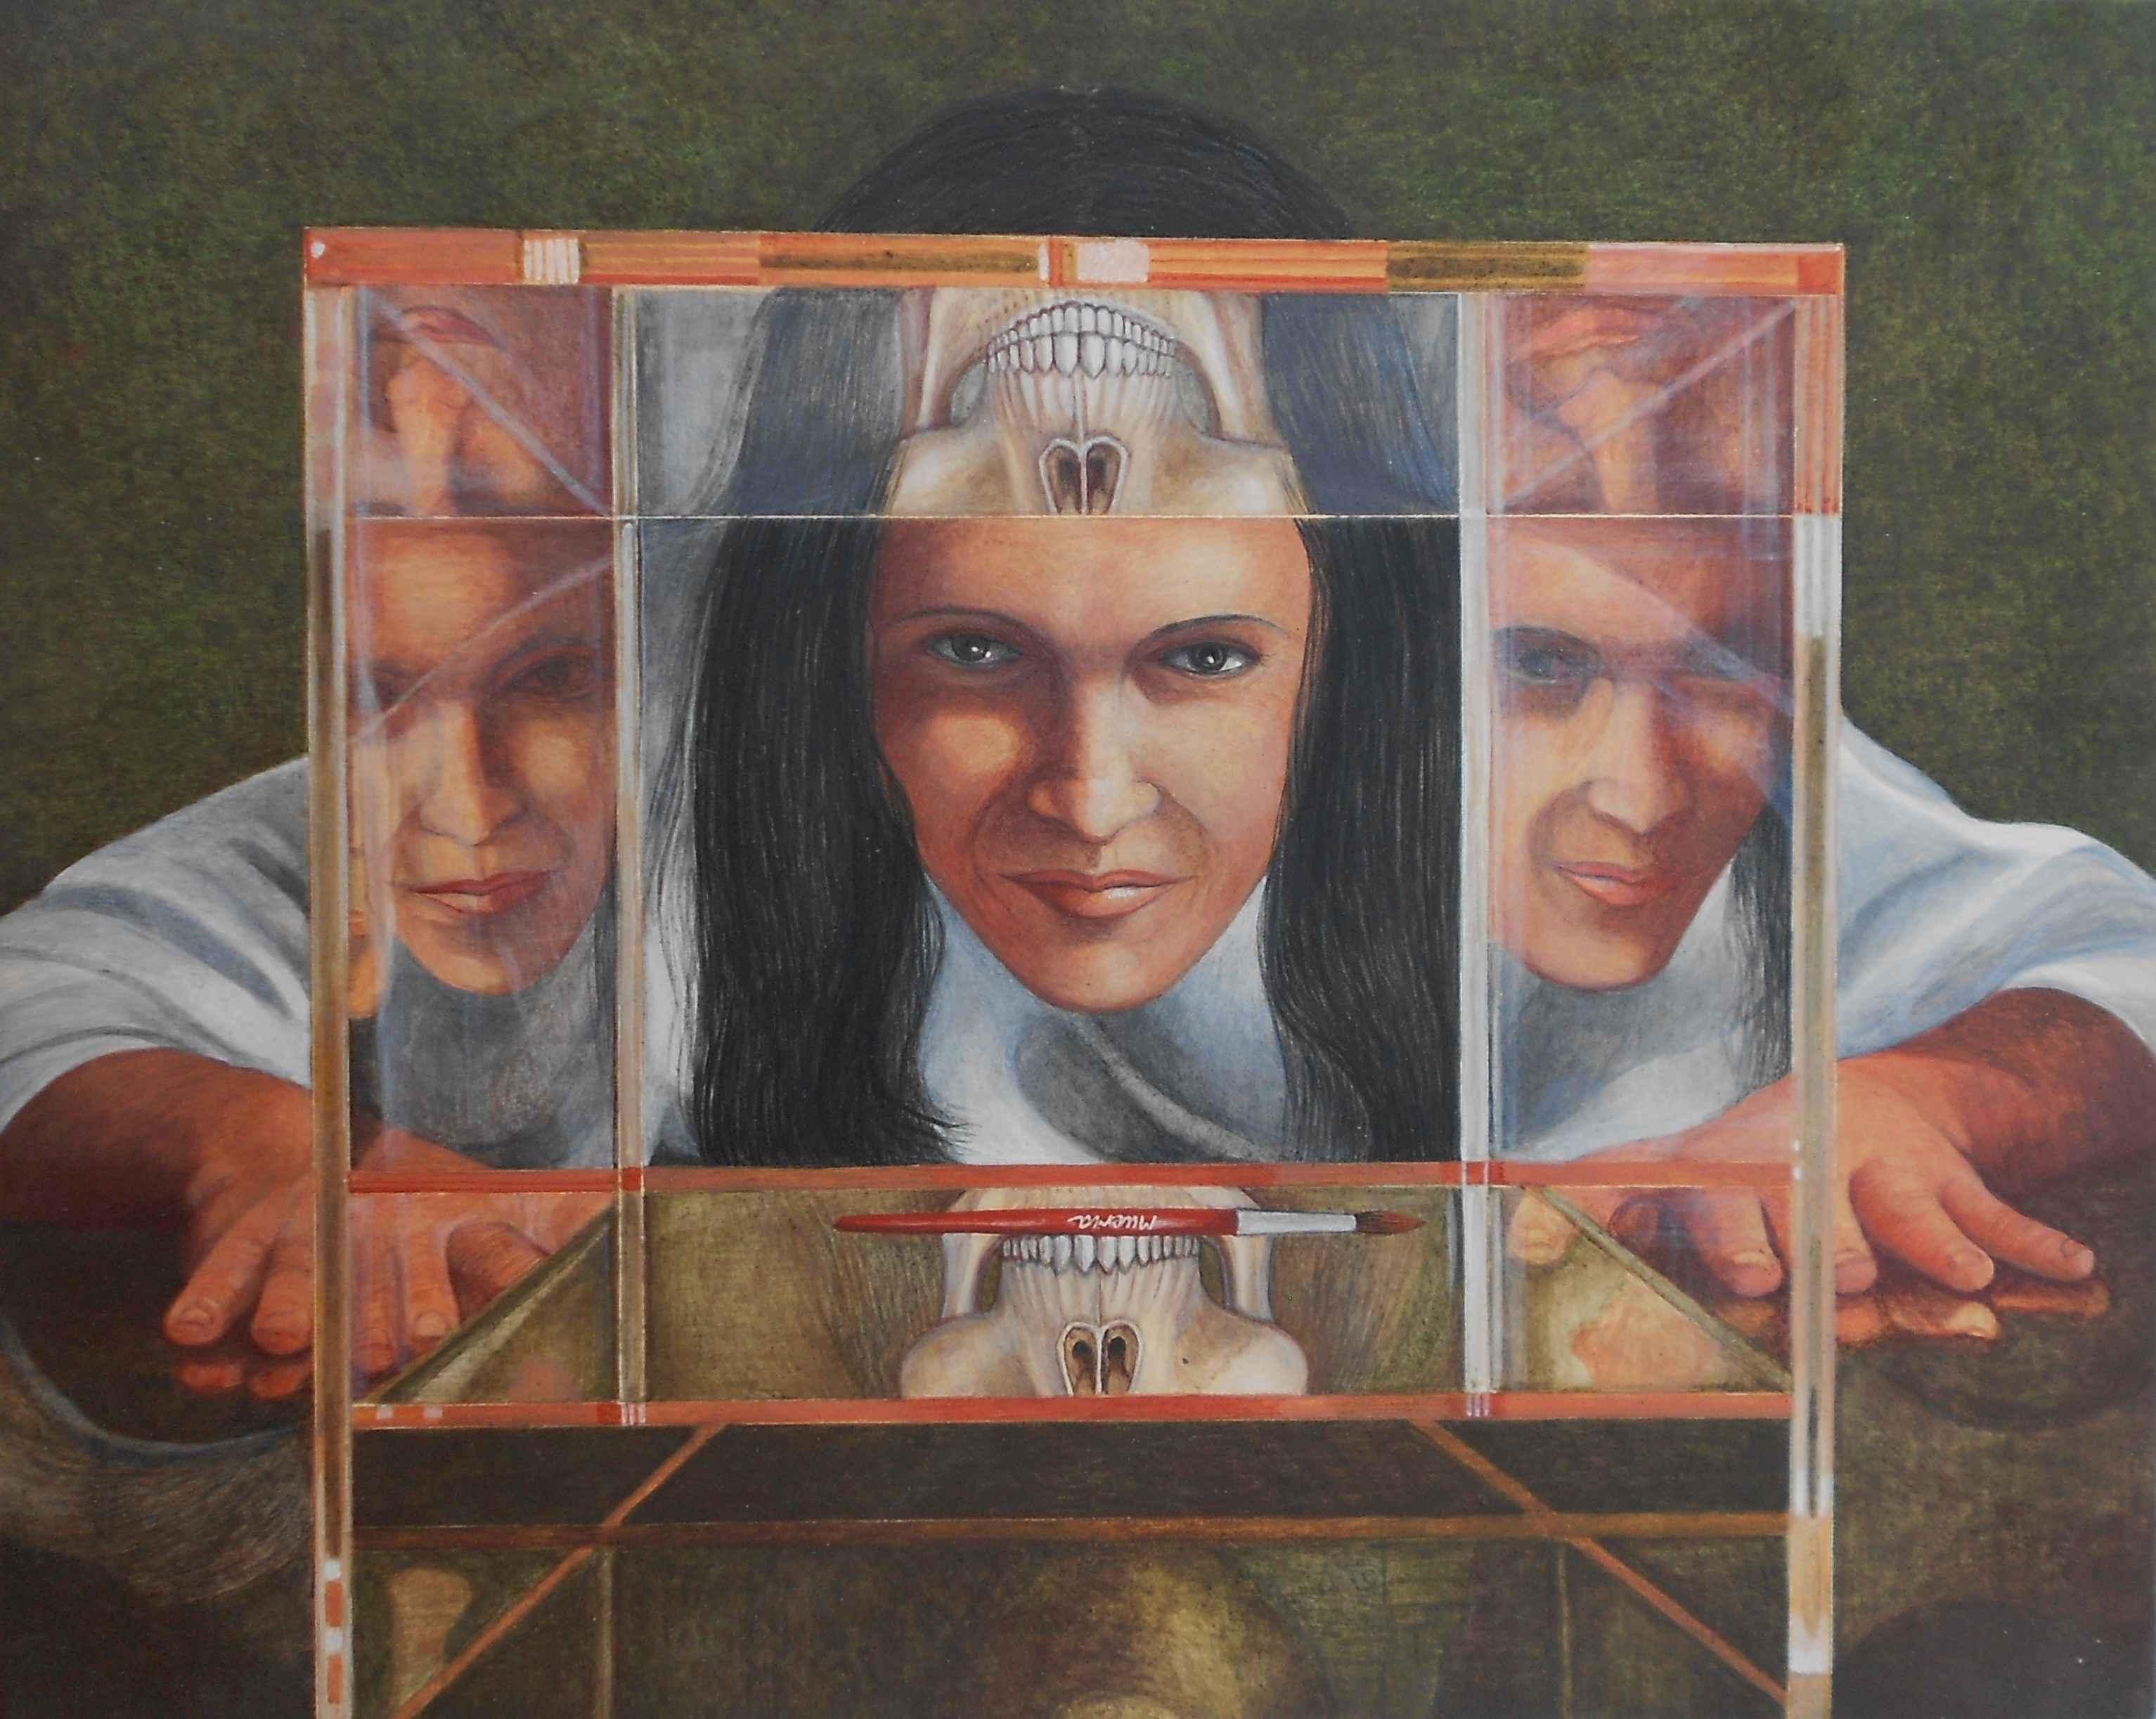 THEY WANT TO CONDEMN ... by Mrs. MARIANELA DE LA HOZ - Masterpiece Online